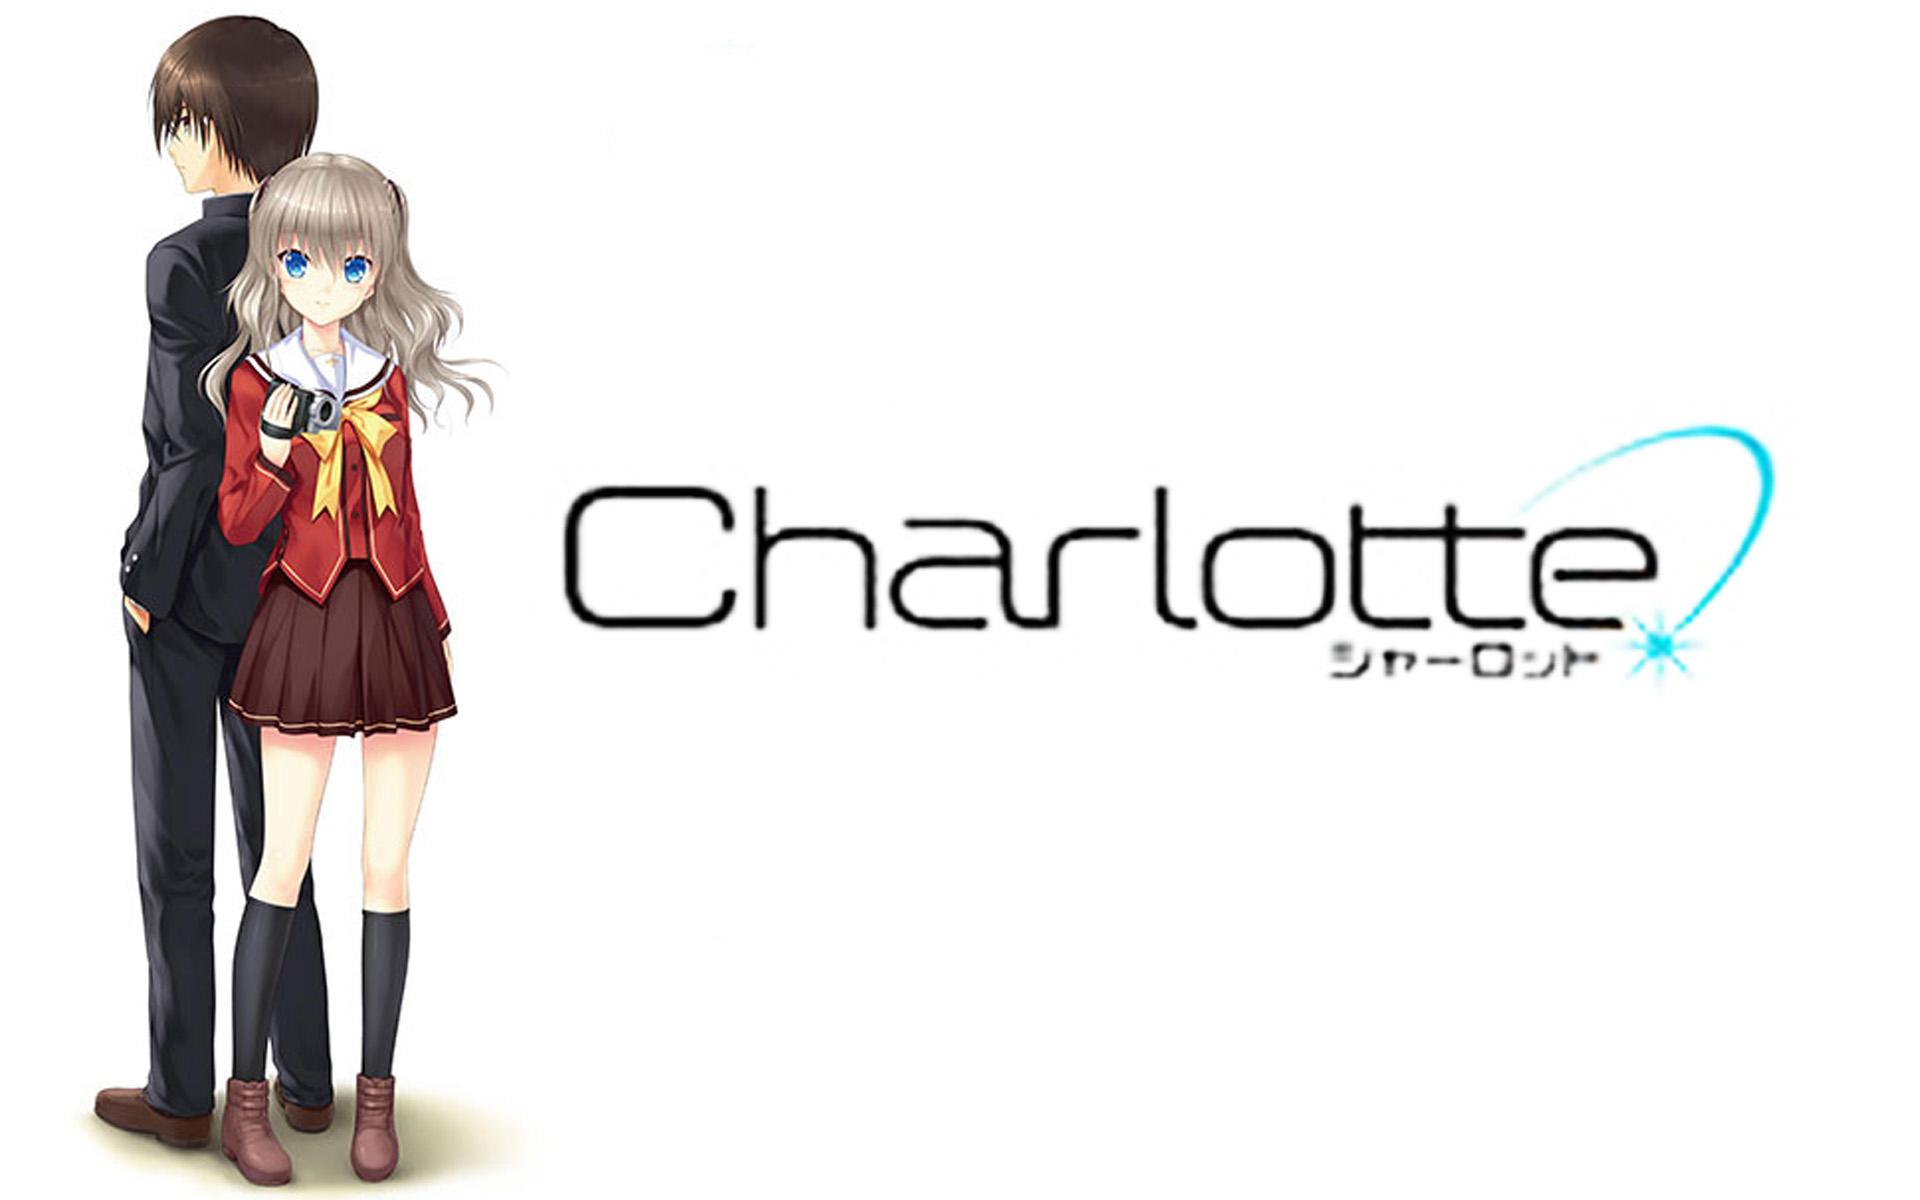 Free Download Cute Girl Wallpaper Anime Charlotte Backgrounds Pixelstalk Net